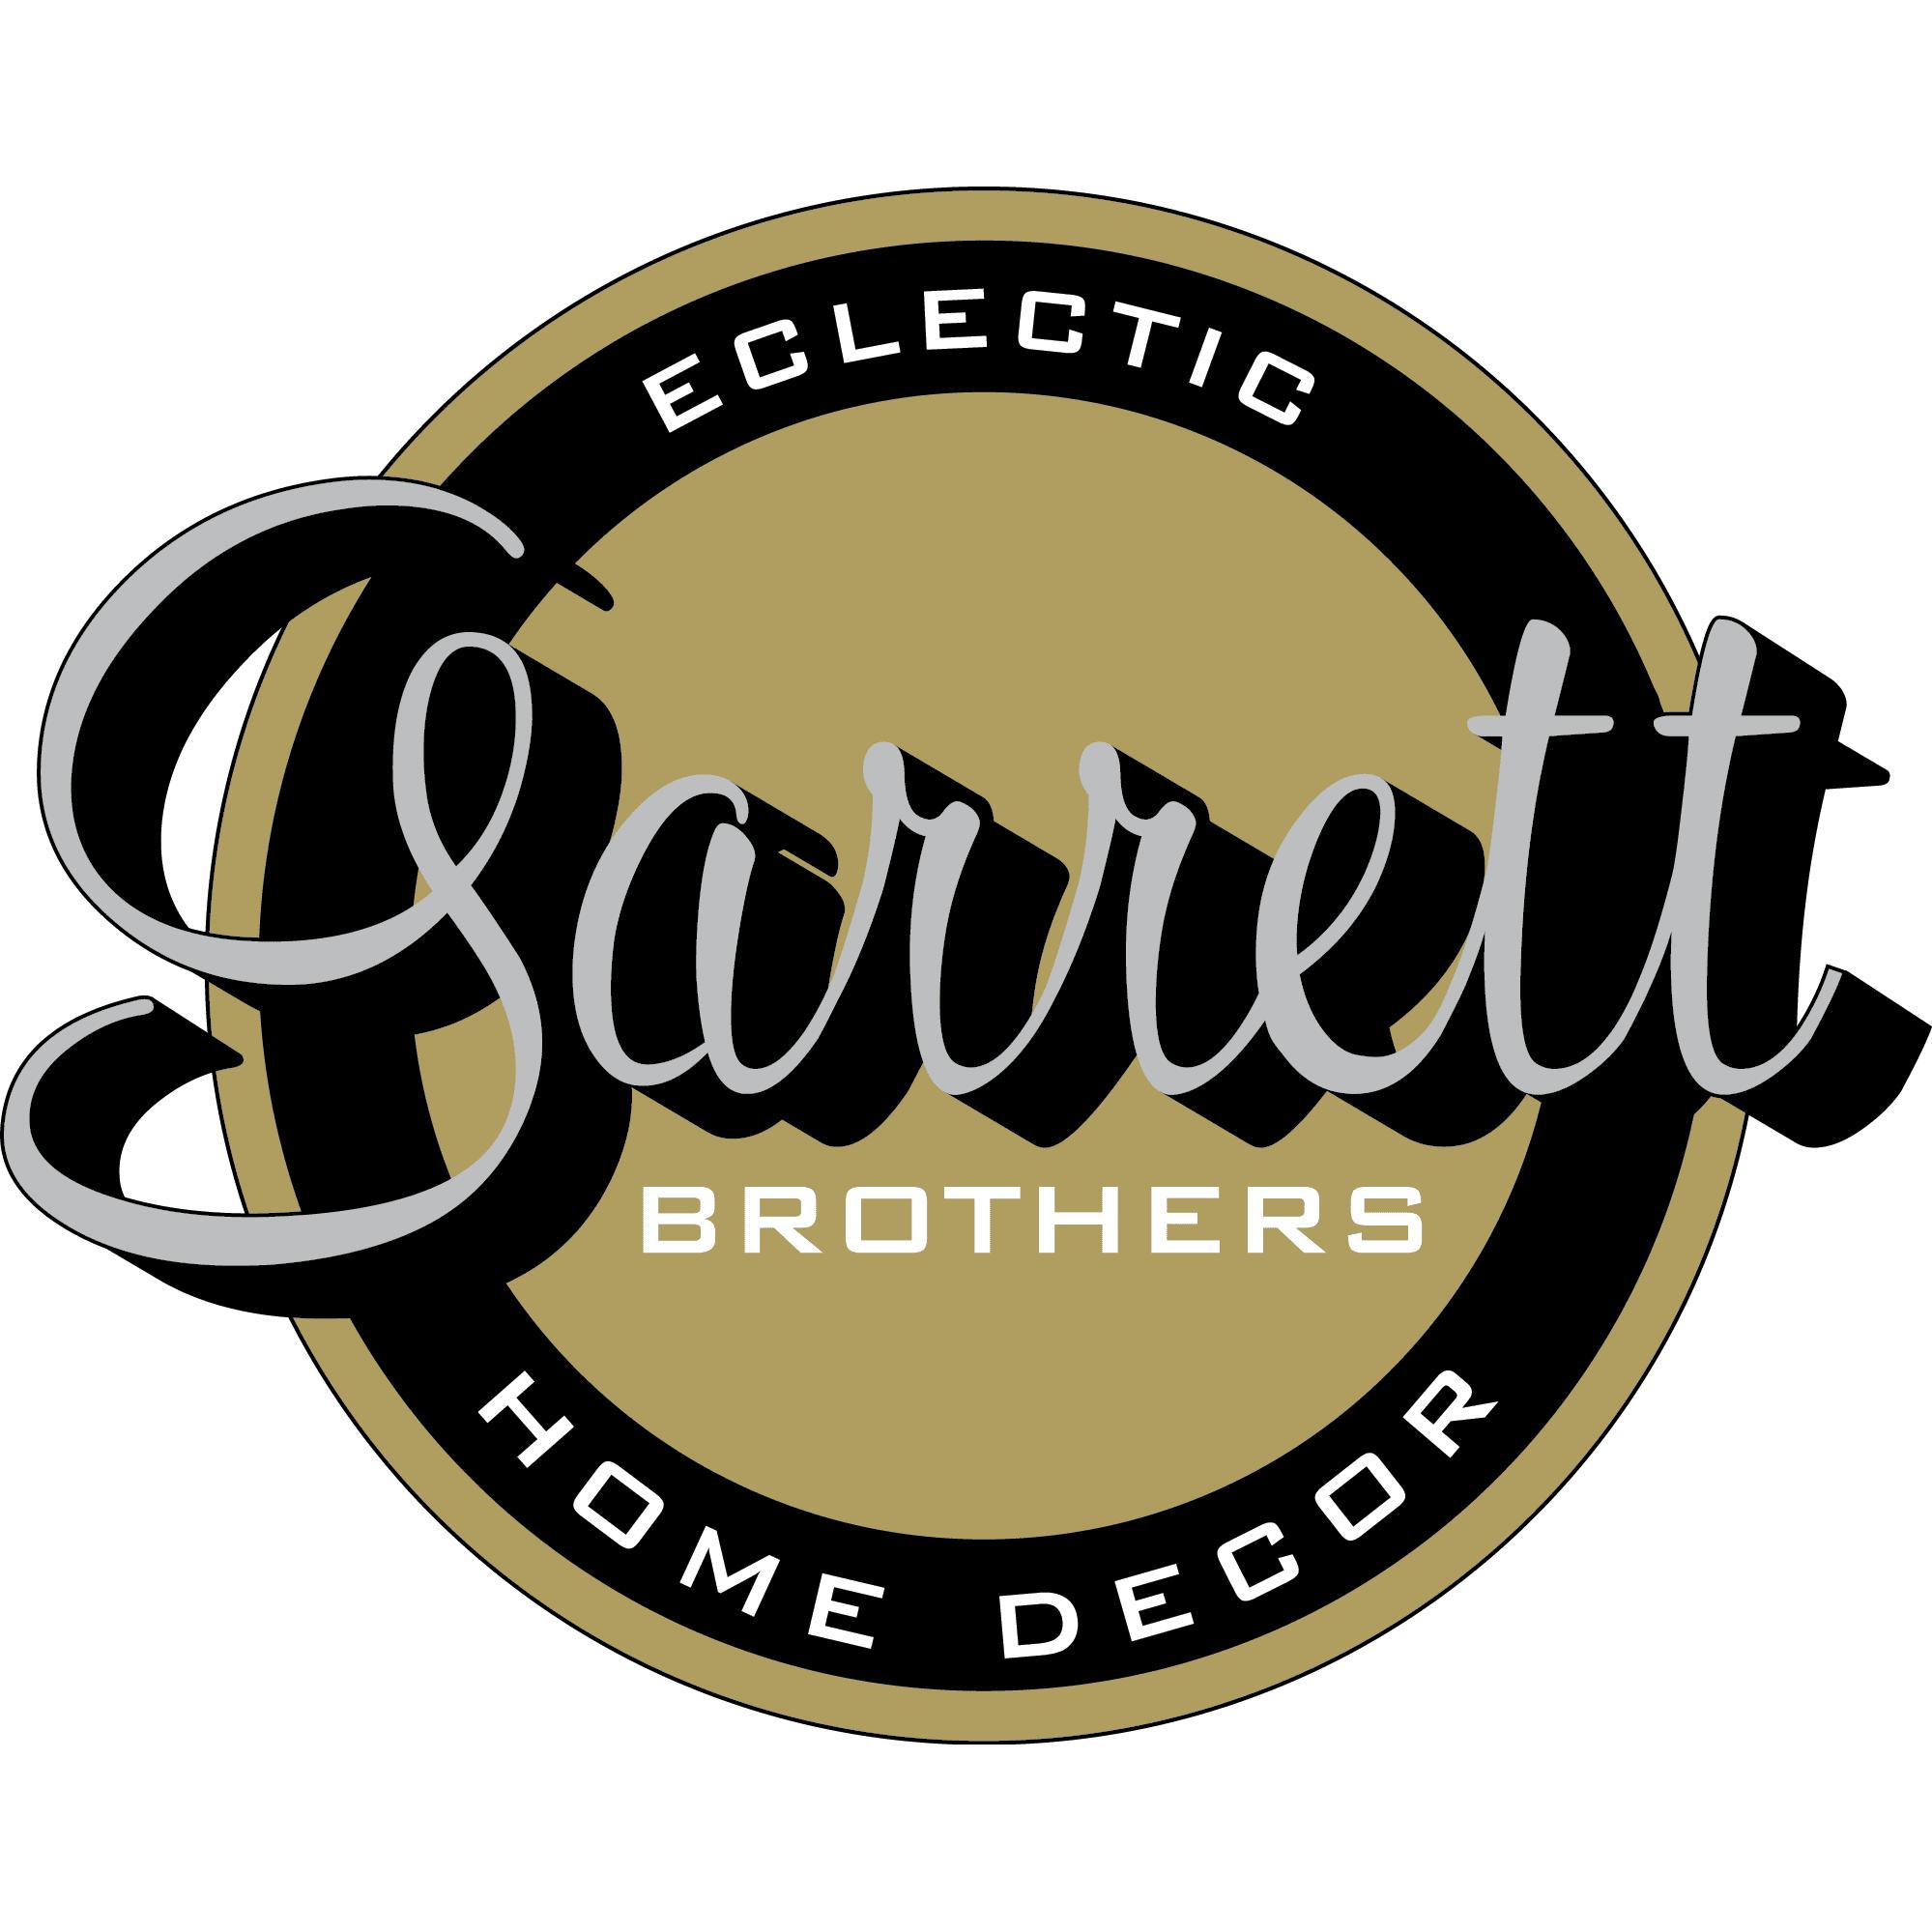 Garrett Brothers Home Decor